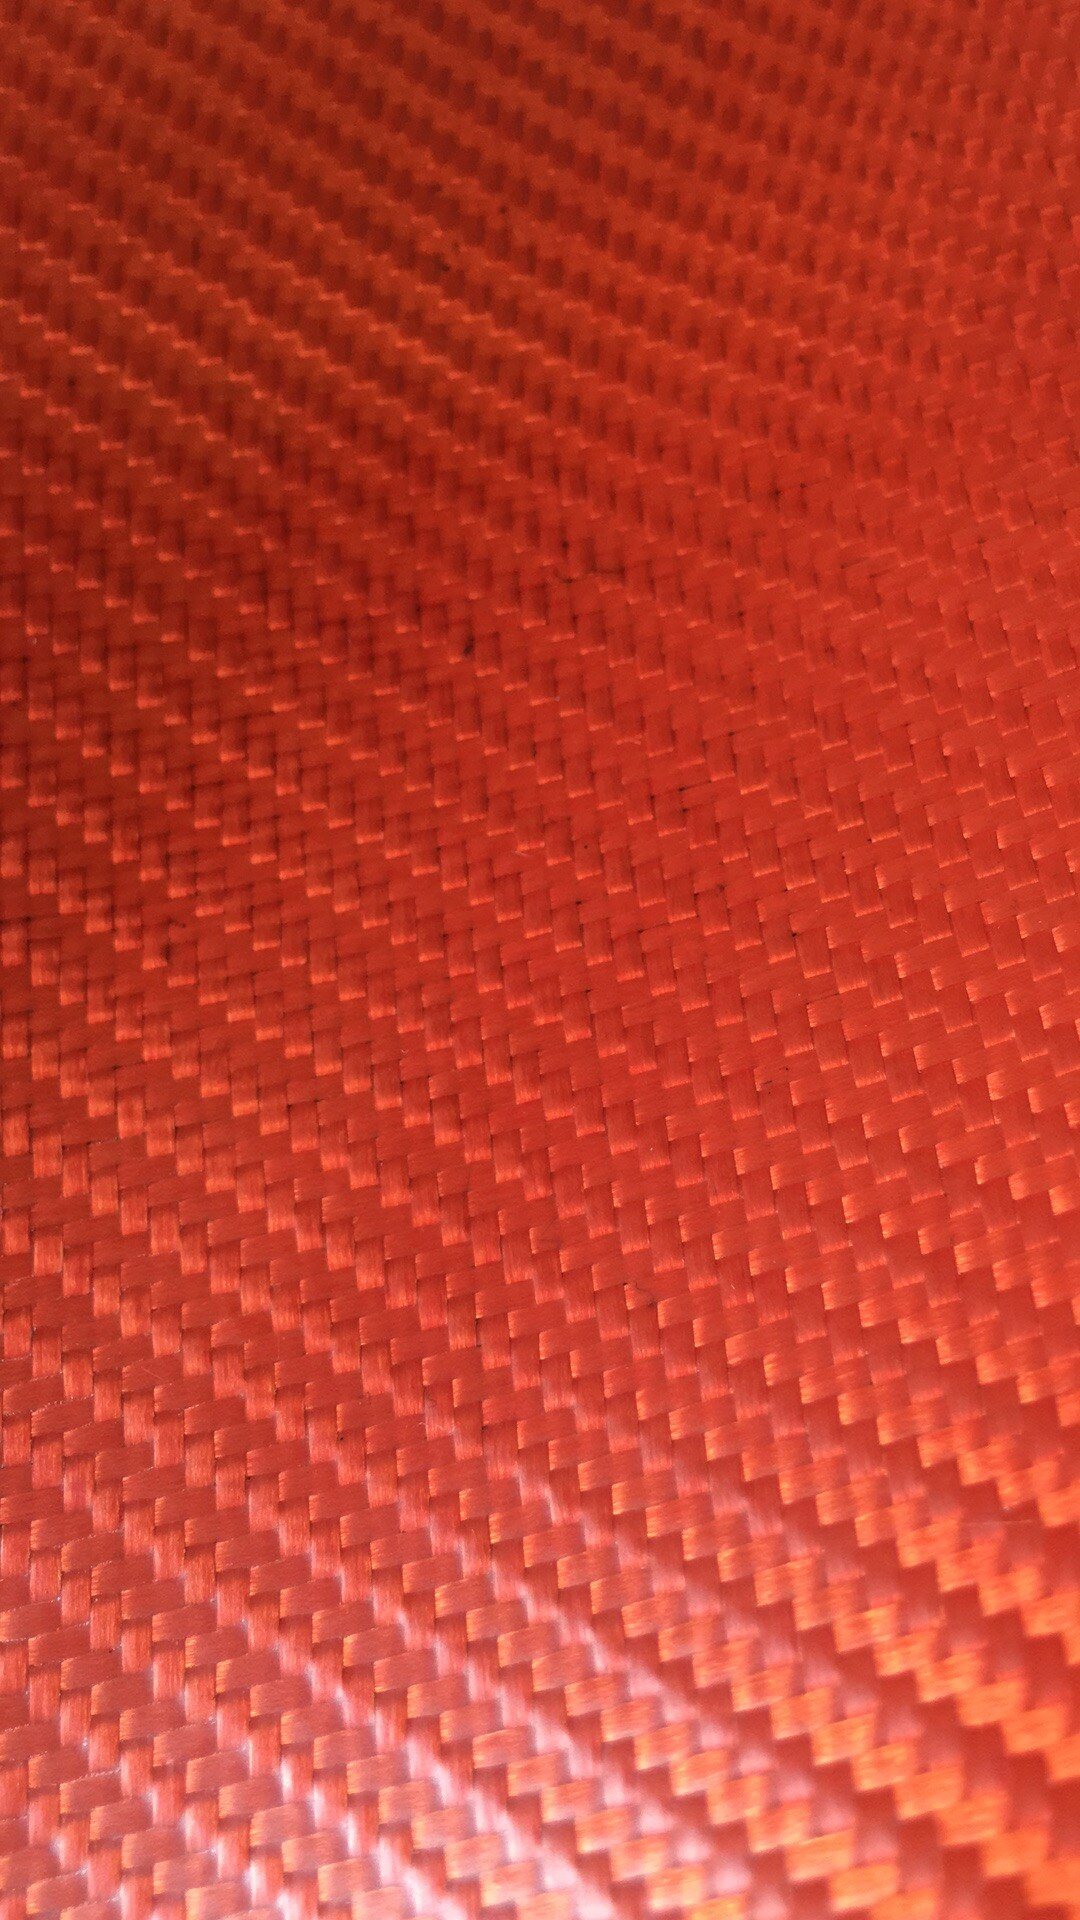 Laranja kevlar tecido PARA-ARAMID fibra de sarja sintética nomex 1100d 200gsm 1m de largura